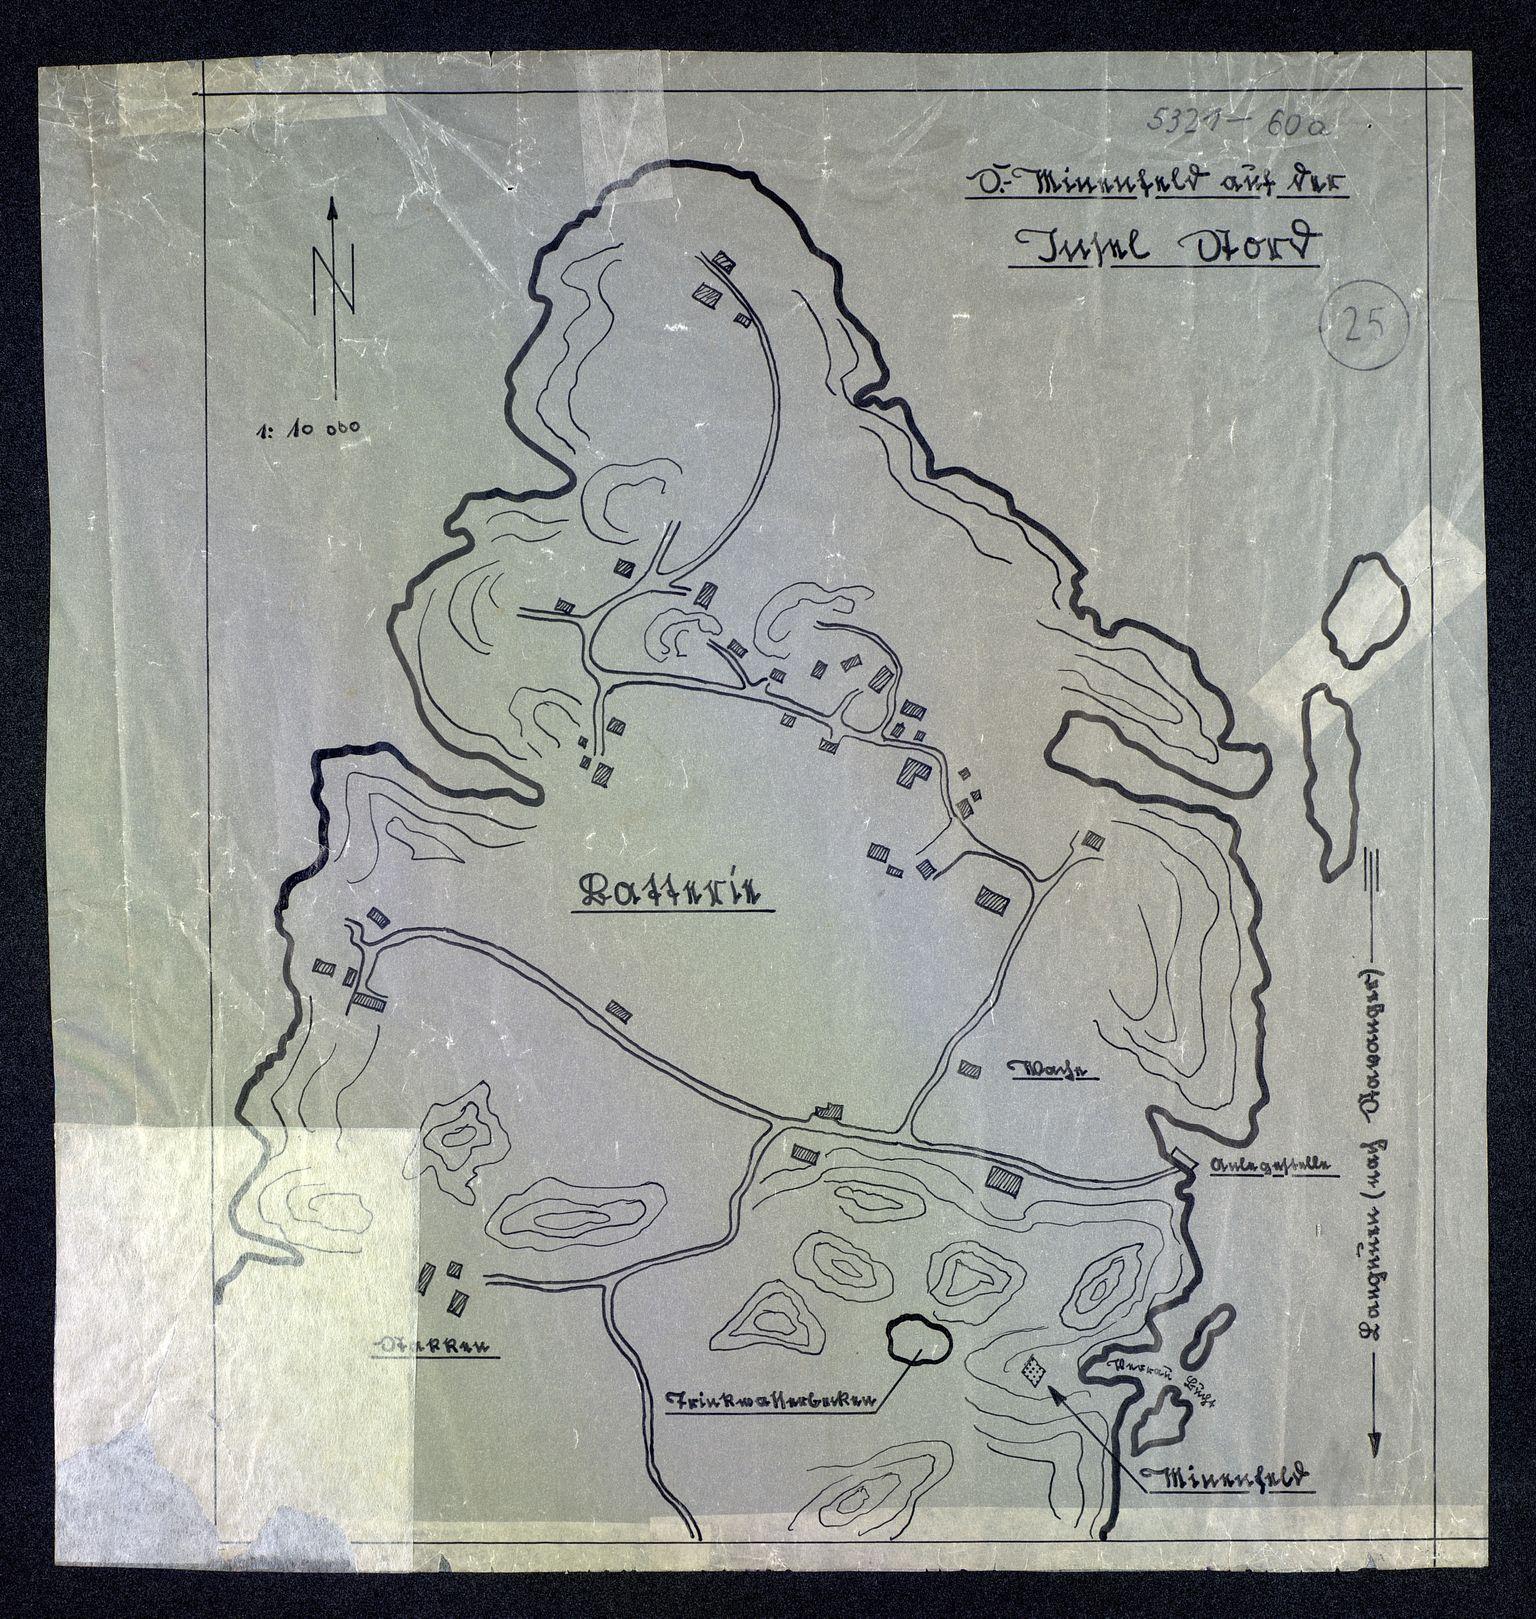 SAB, Ukjent arkiv (SAB), 1943-1945, s. 28